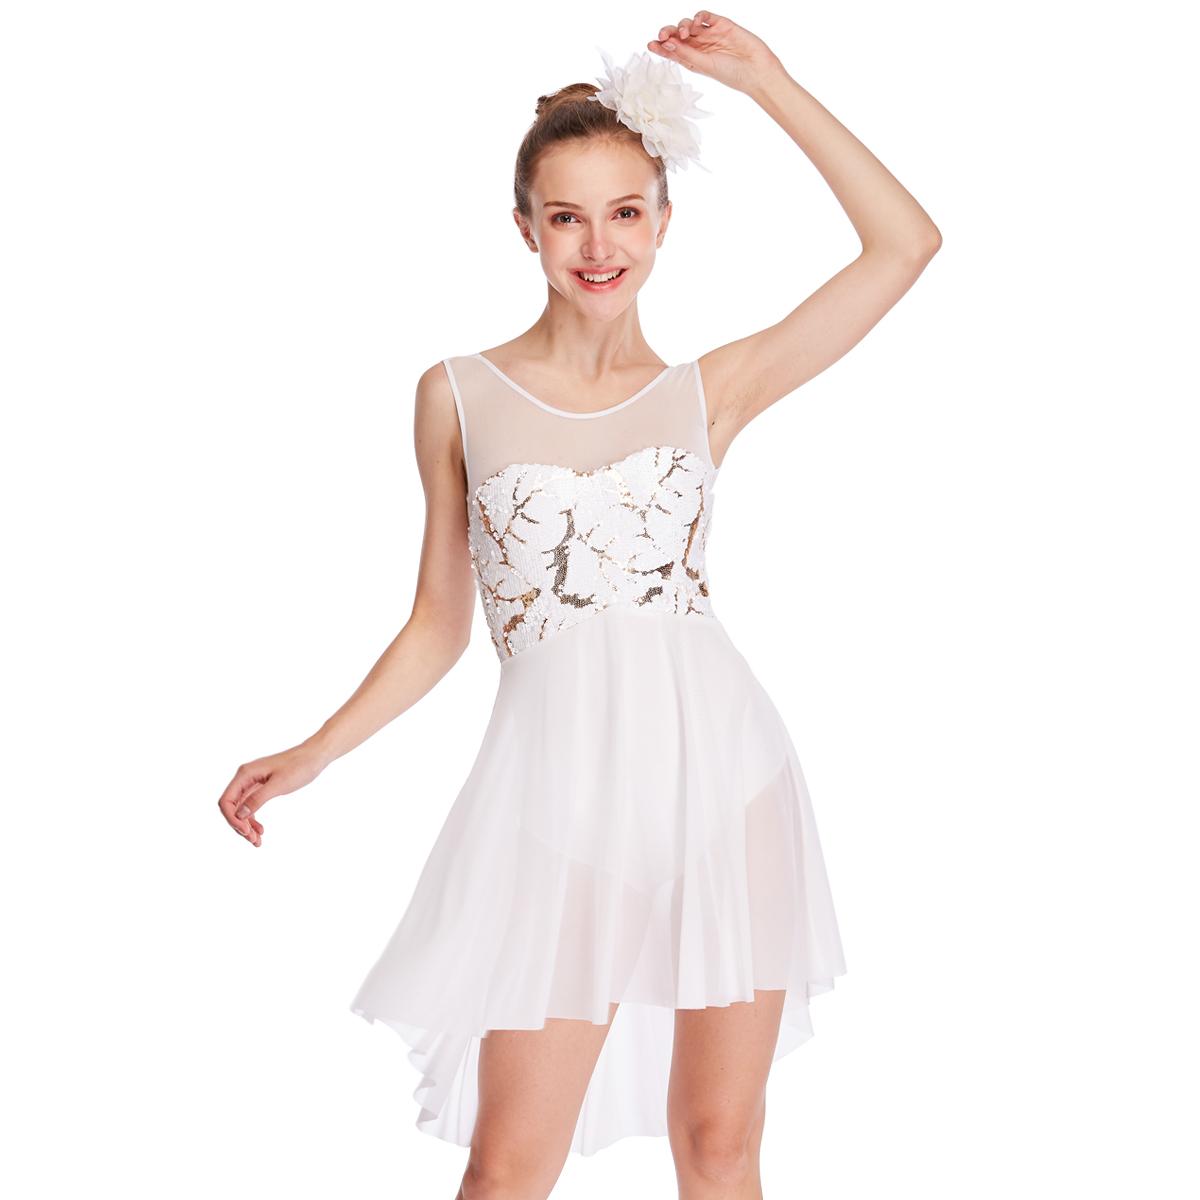 Gentle Peach High Neck Multi Sequin Lyrical Dress Dance Costume